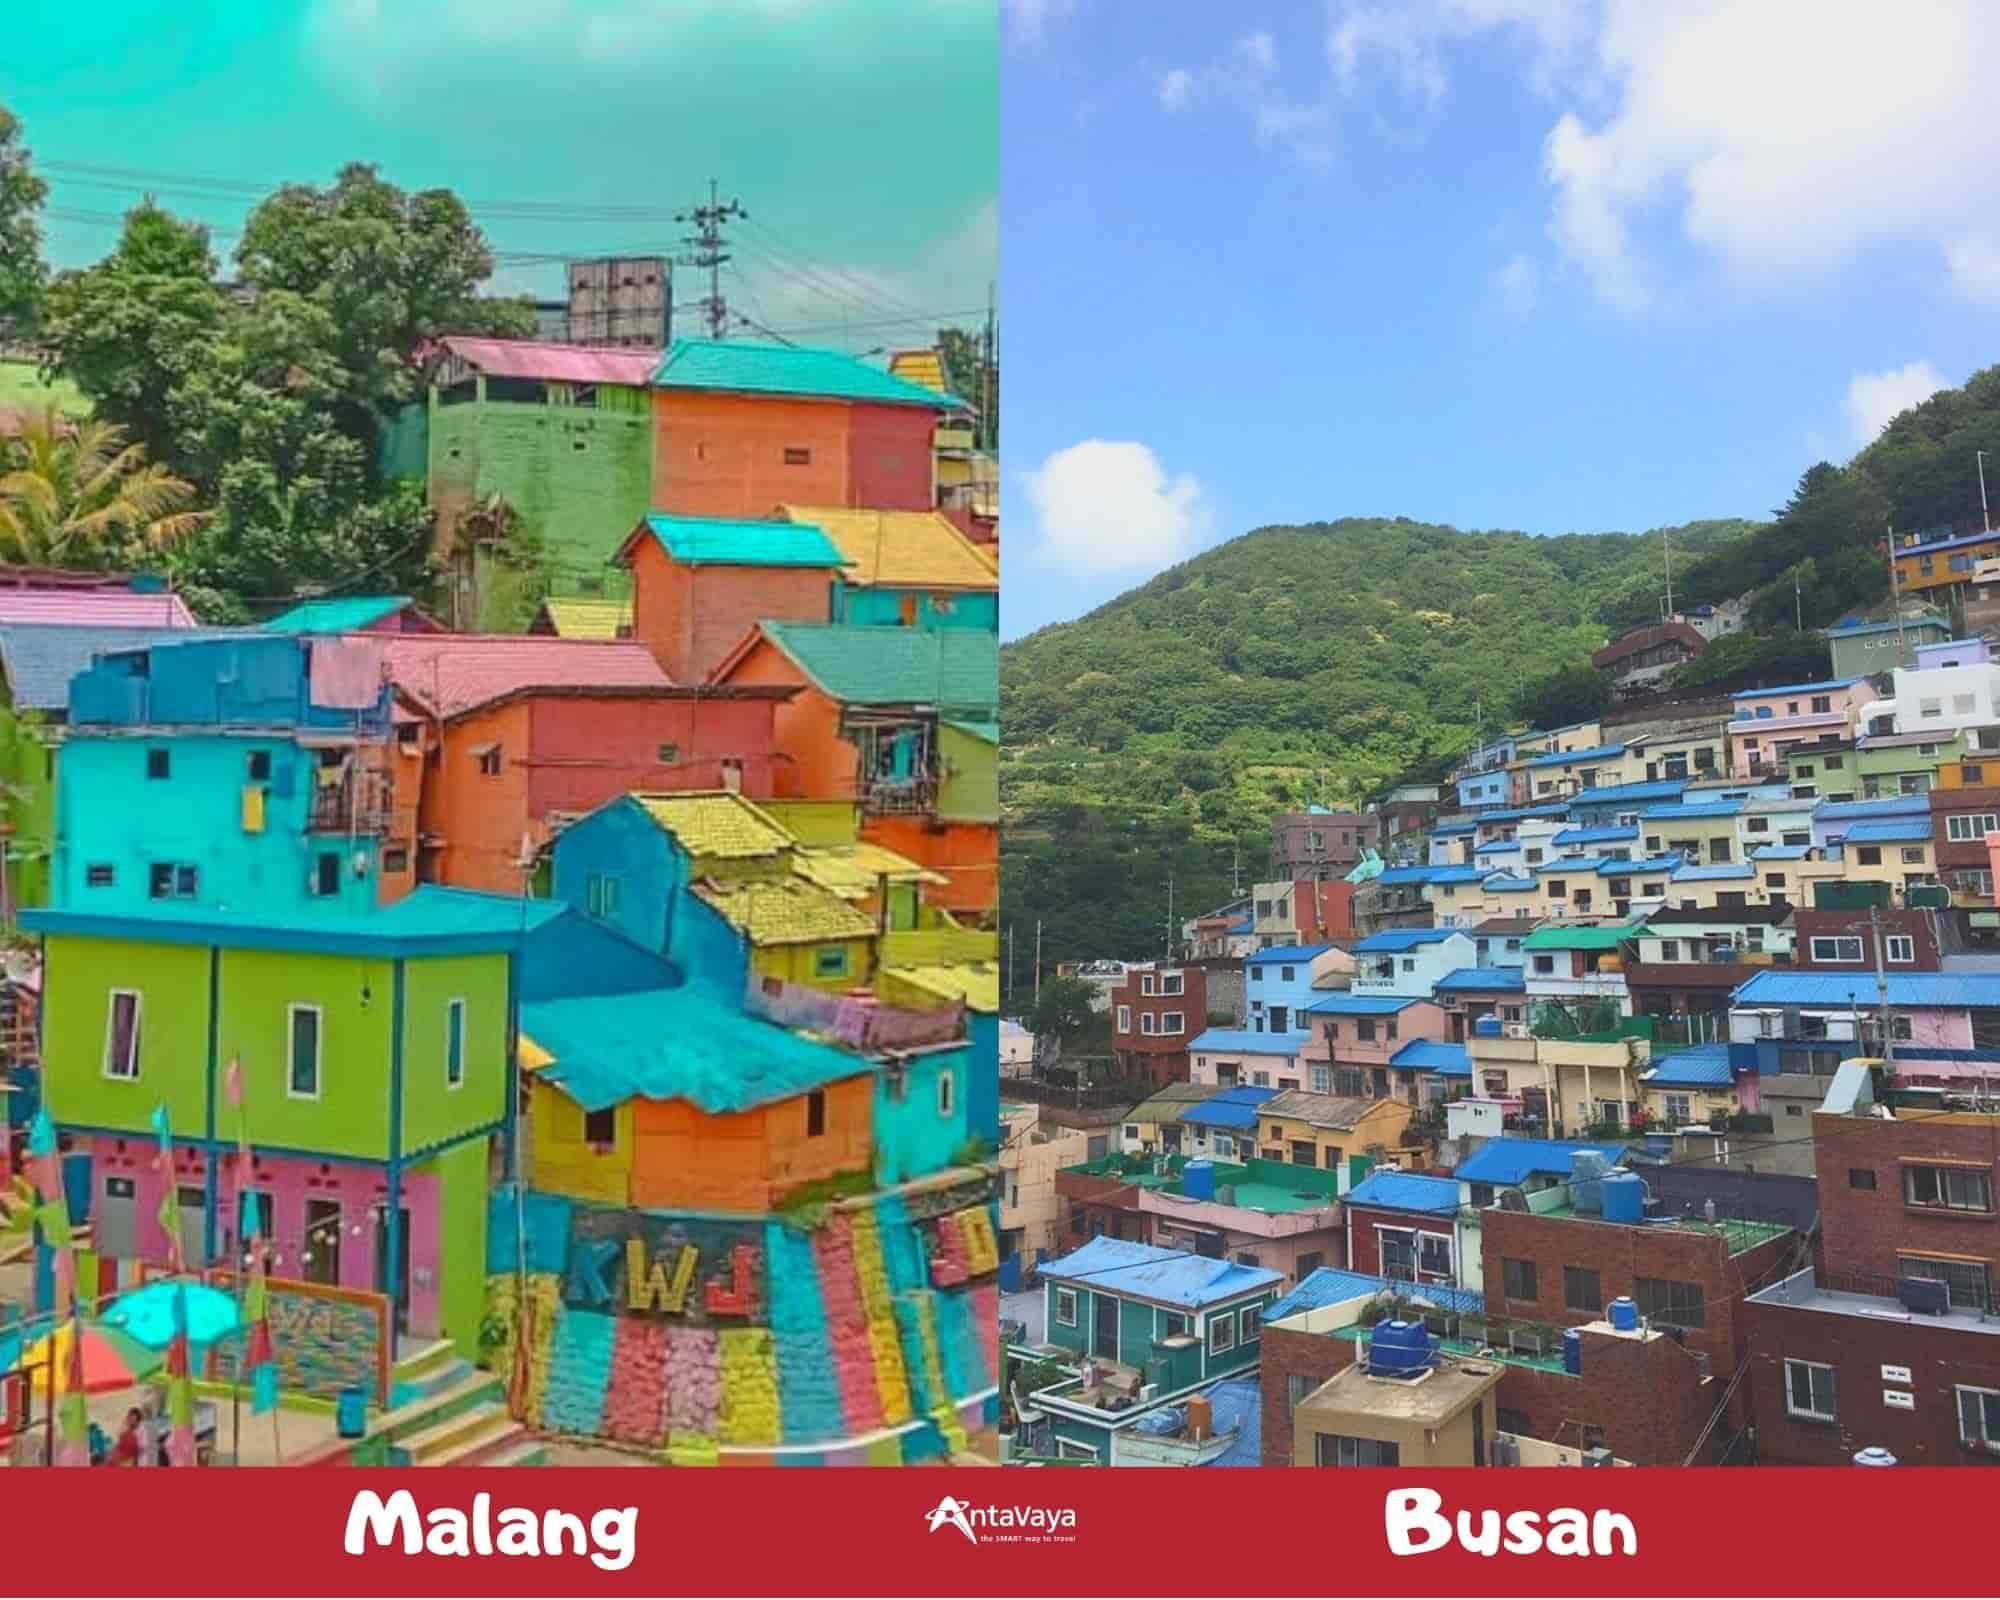 Spot Destinasi Indonesia Mirip Luar Negeri - Sumber Instagram nanik.setiawati dan gamcheonculturevillage